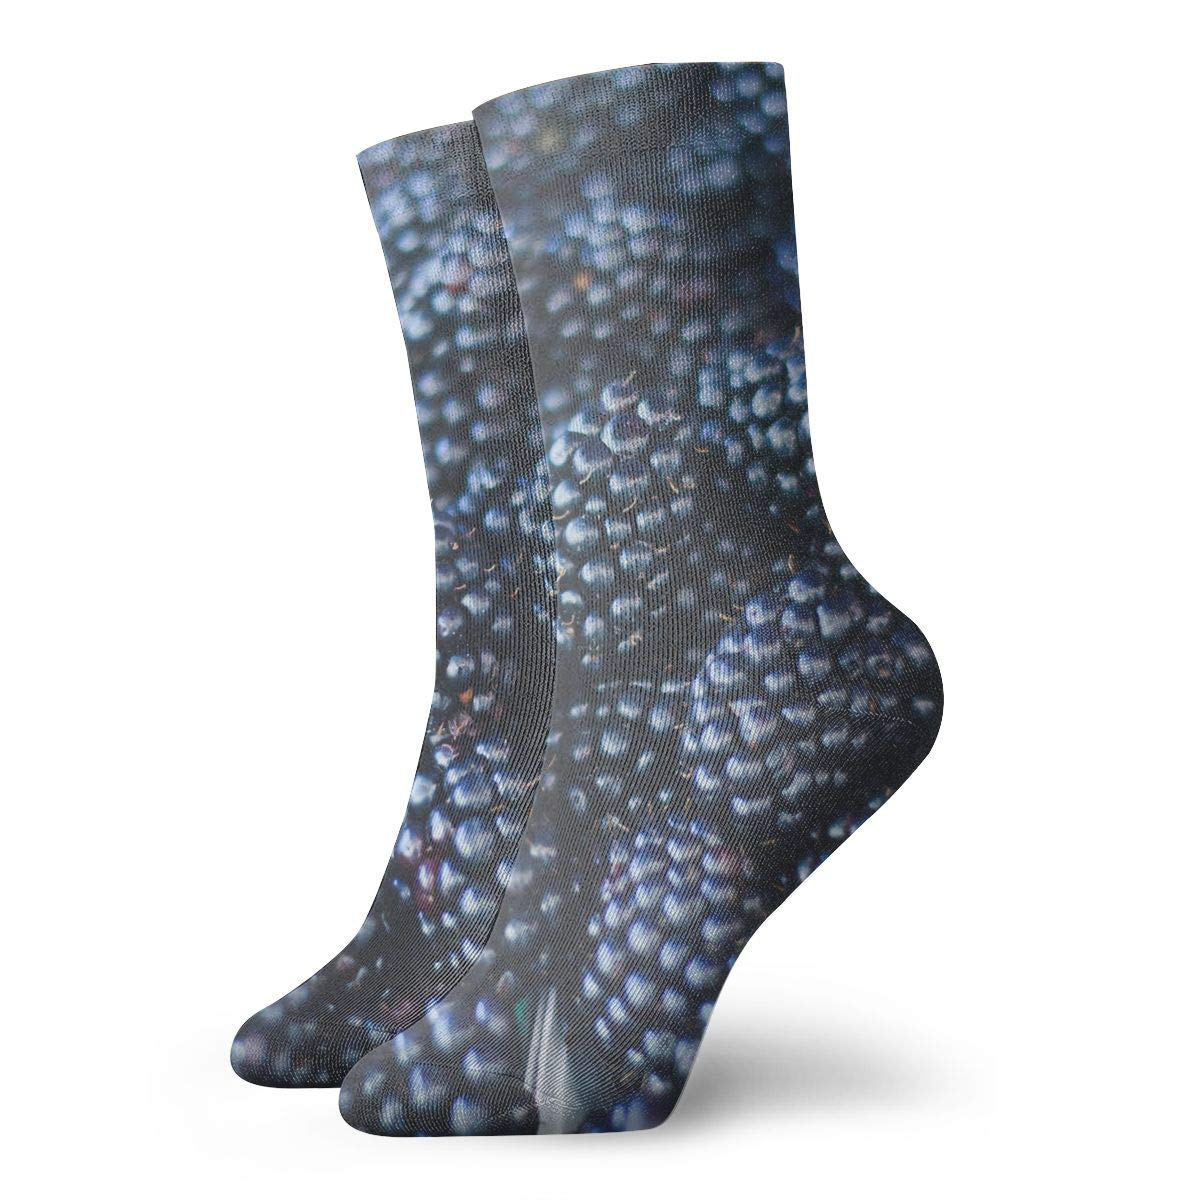 WEEDKEYCAT Black Raspberry Ripe Adult Short Socks Cotton Funny Socks for Mens Womens Yoga Hiking Cycling Running Soccer Sports